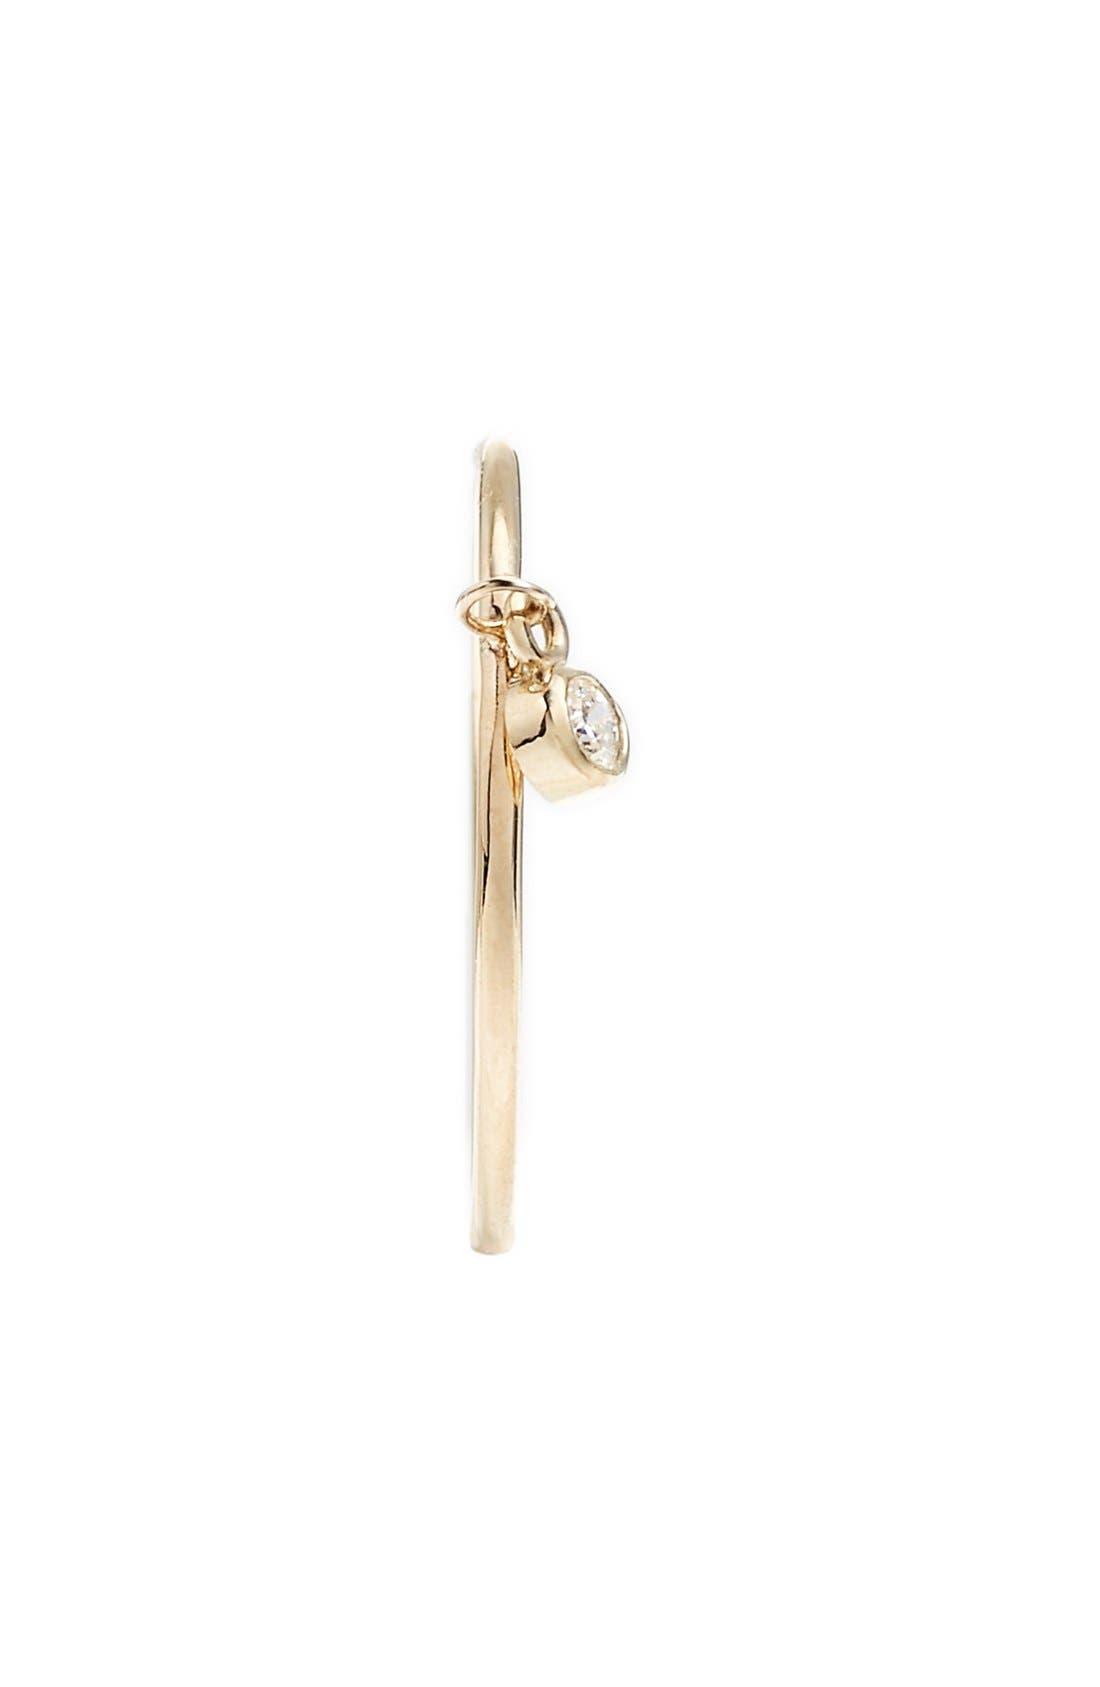 Dangling Diamond Ring,                             Alternate thumbnail 3, color,                             Yellow Gold